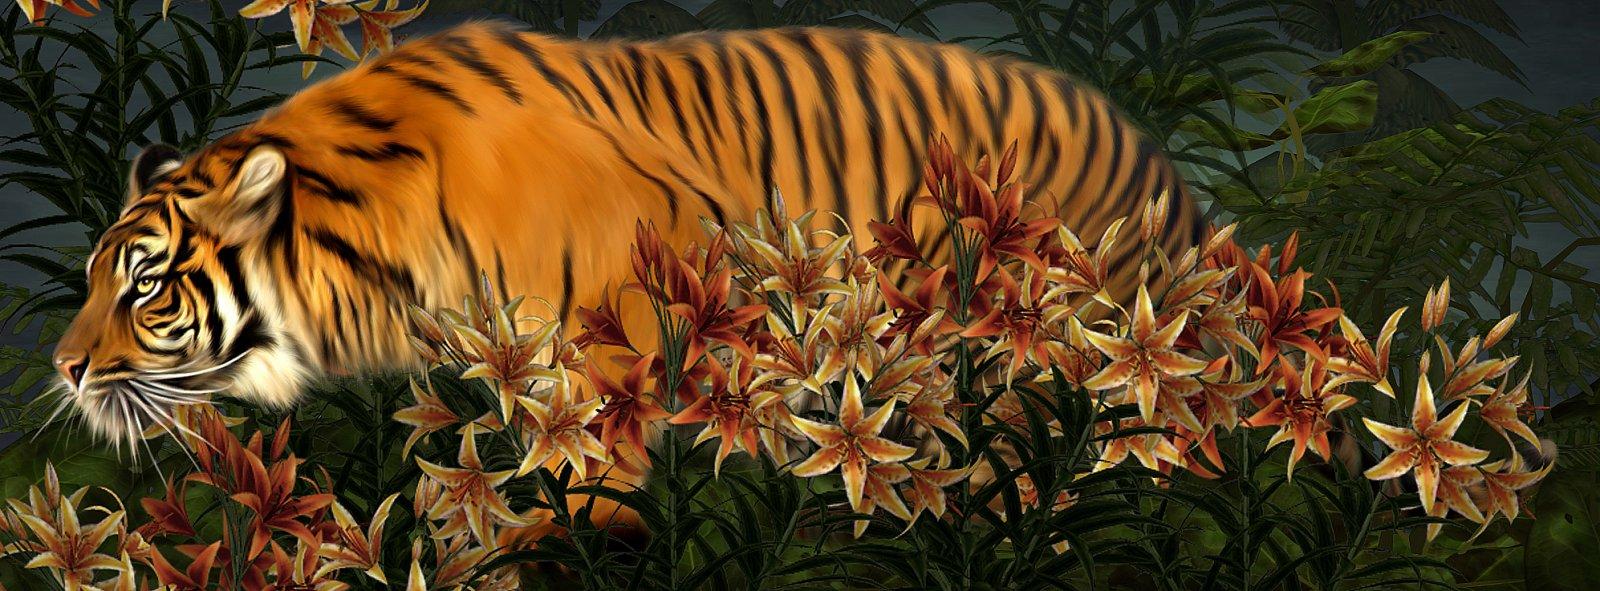 TigerLilies copy 2.jpg